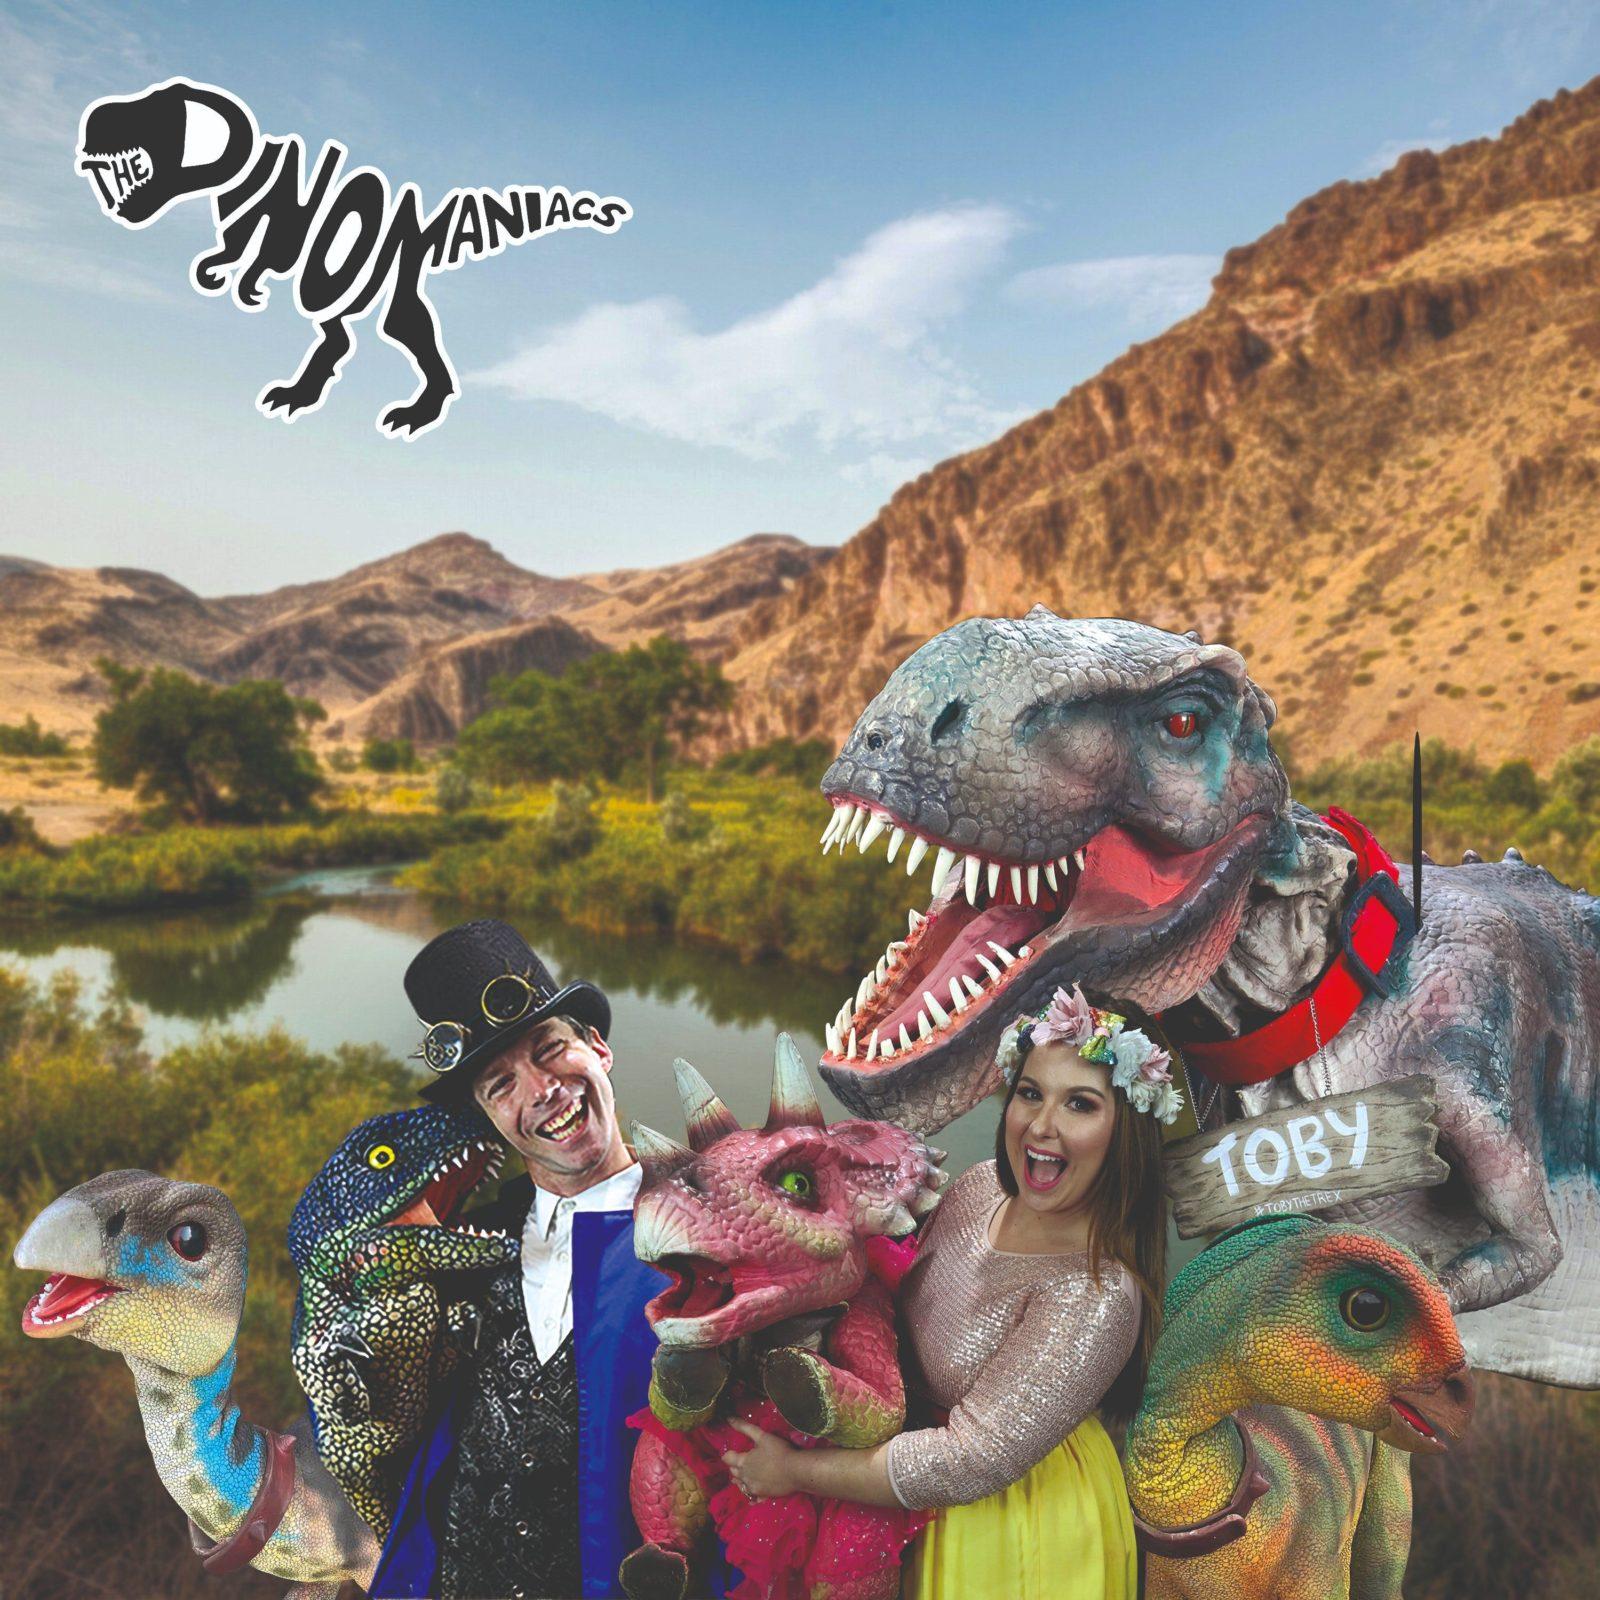 The Dinomaniacs - a family dinosaur adventure